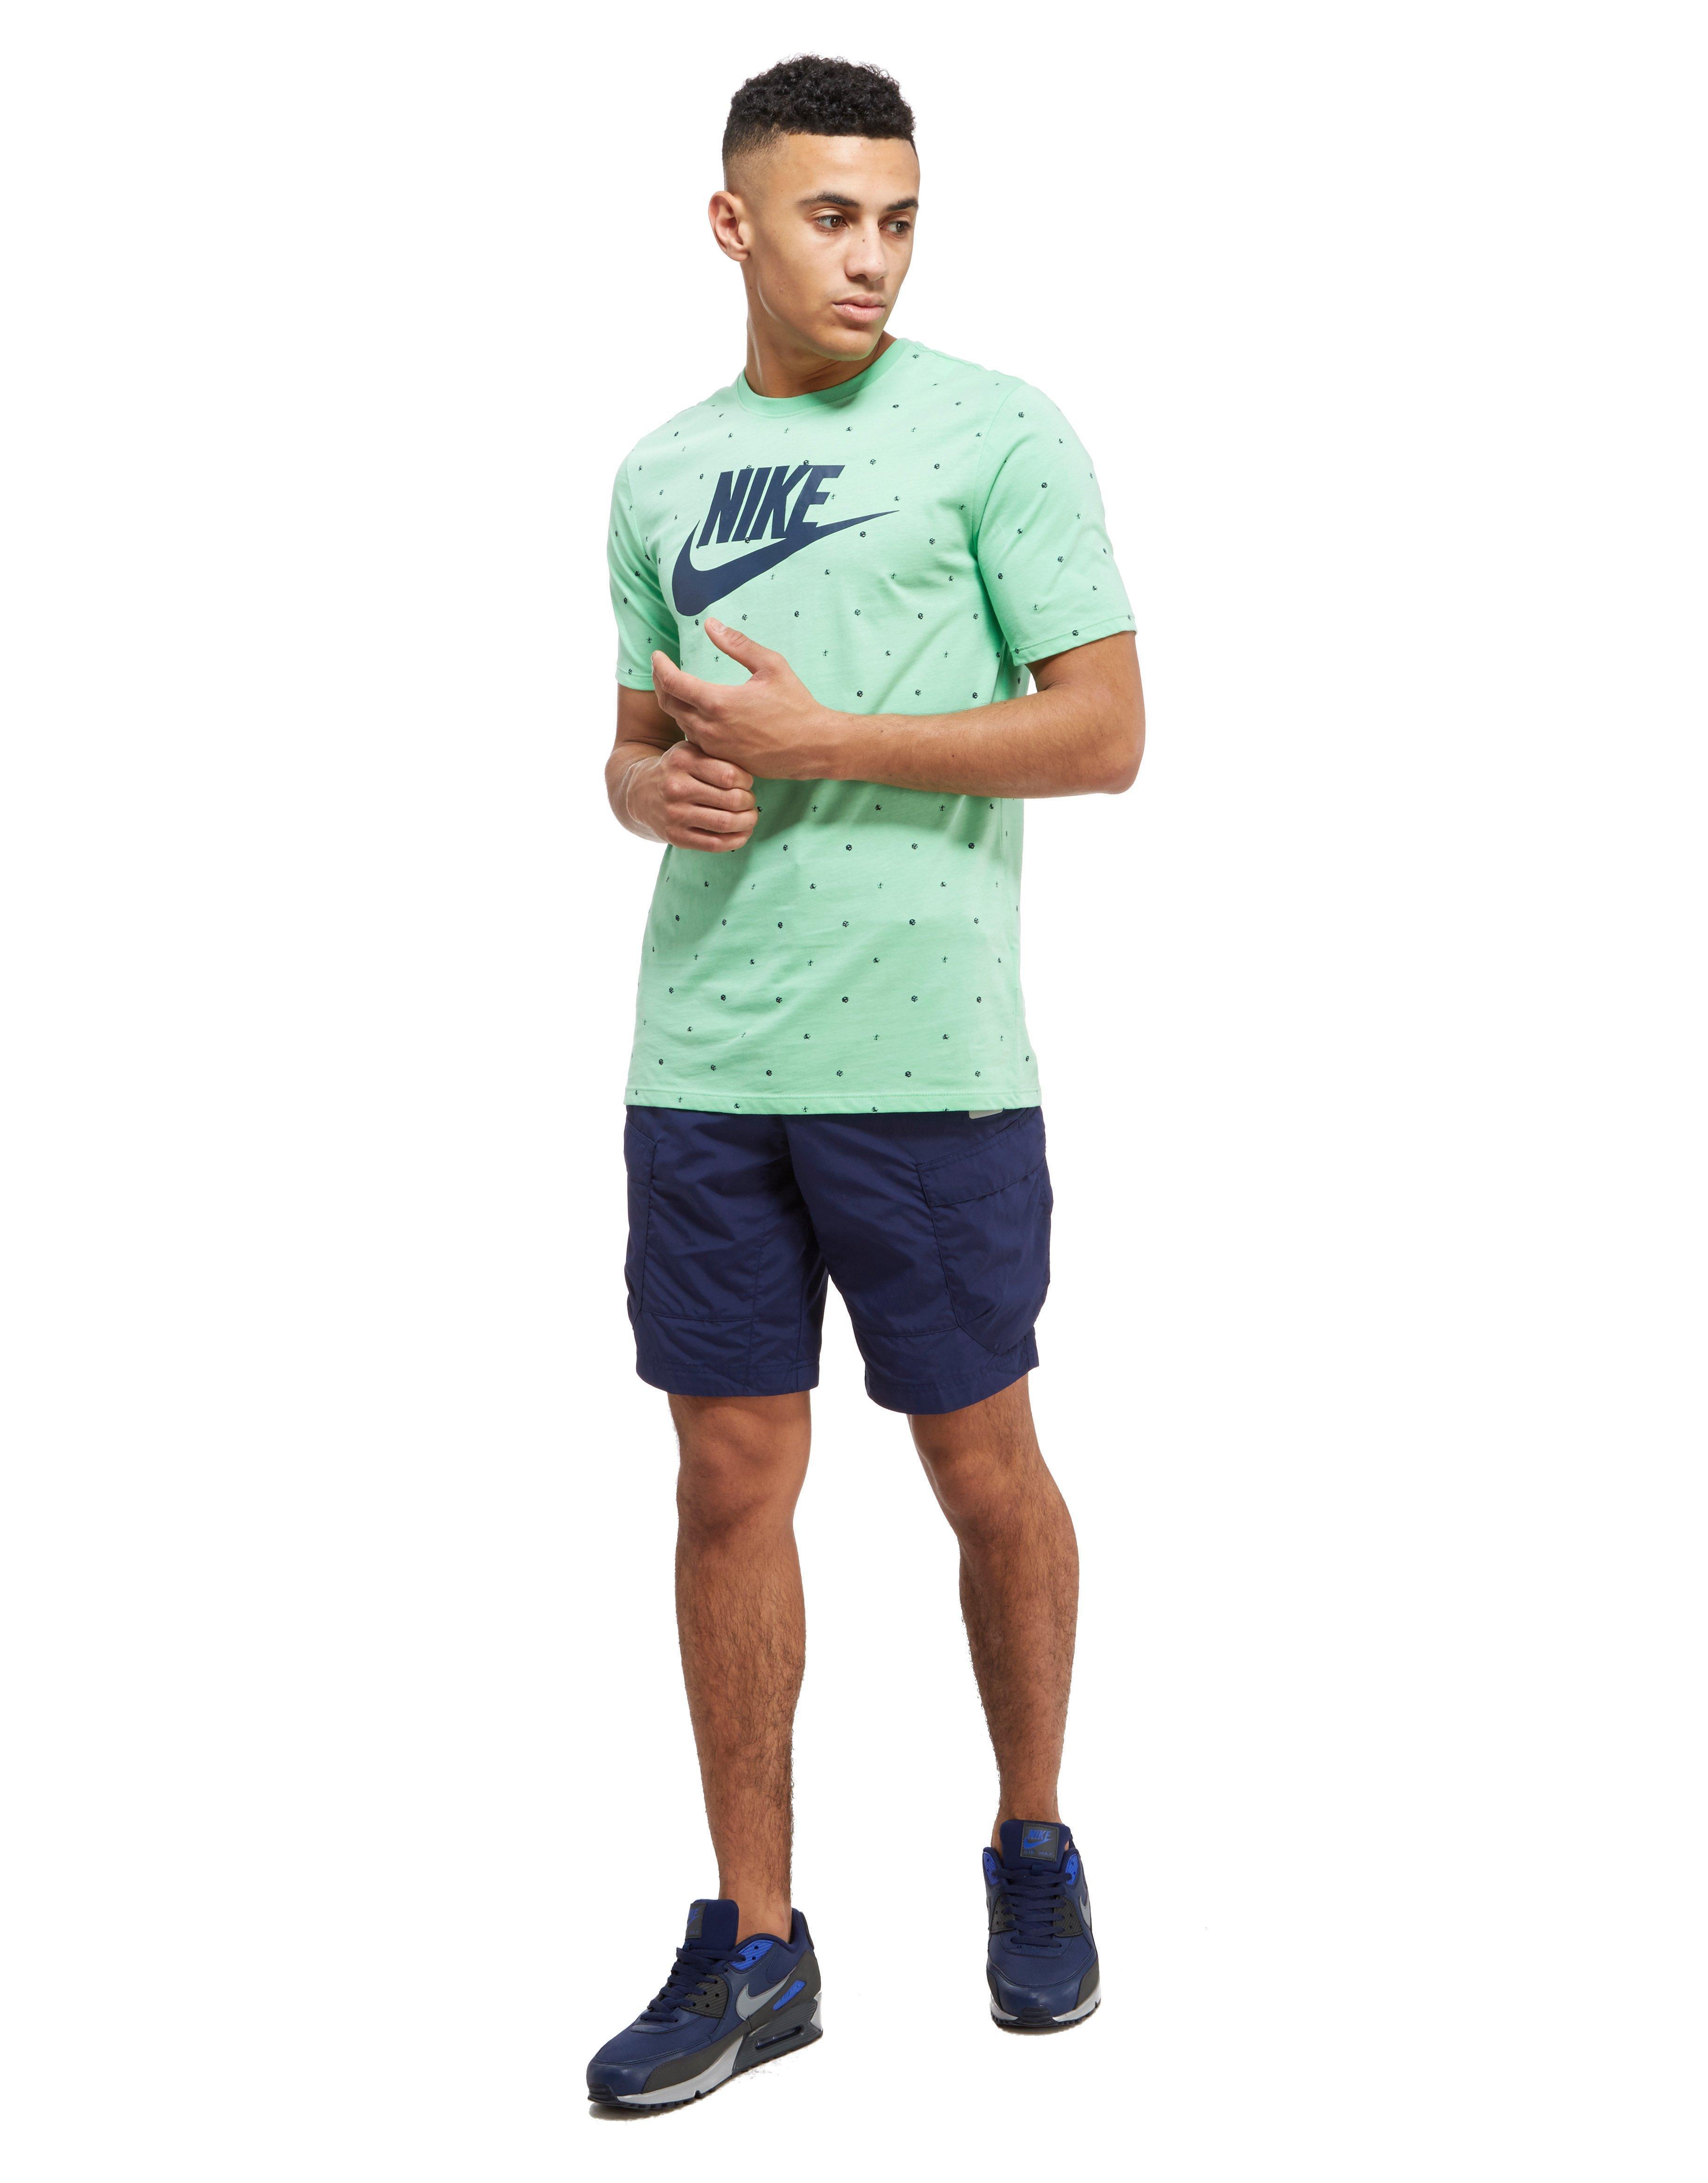 For In Dot Futura Nike Lyst Shirt Men Green T nwP0SqnH6